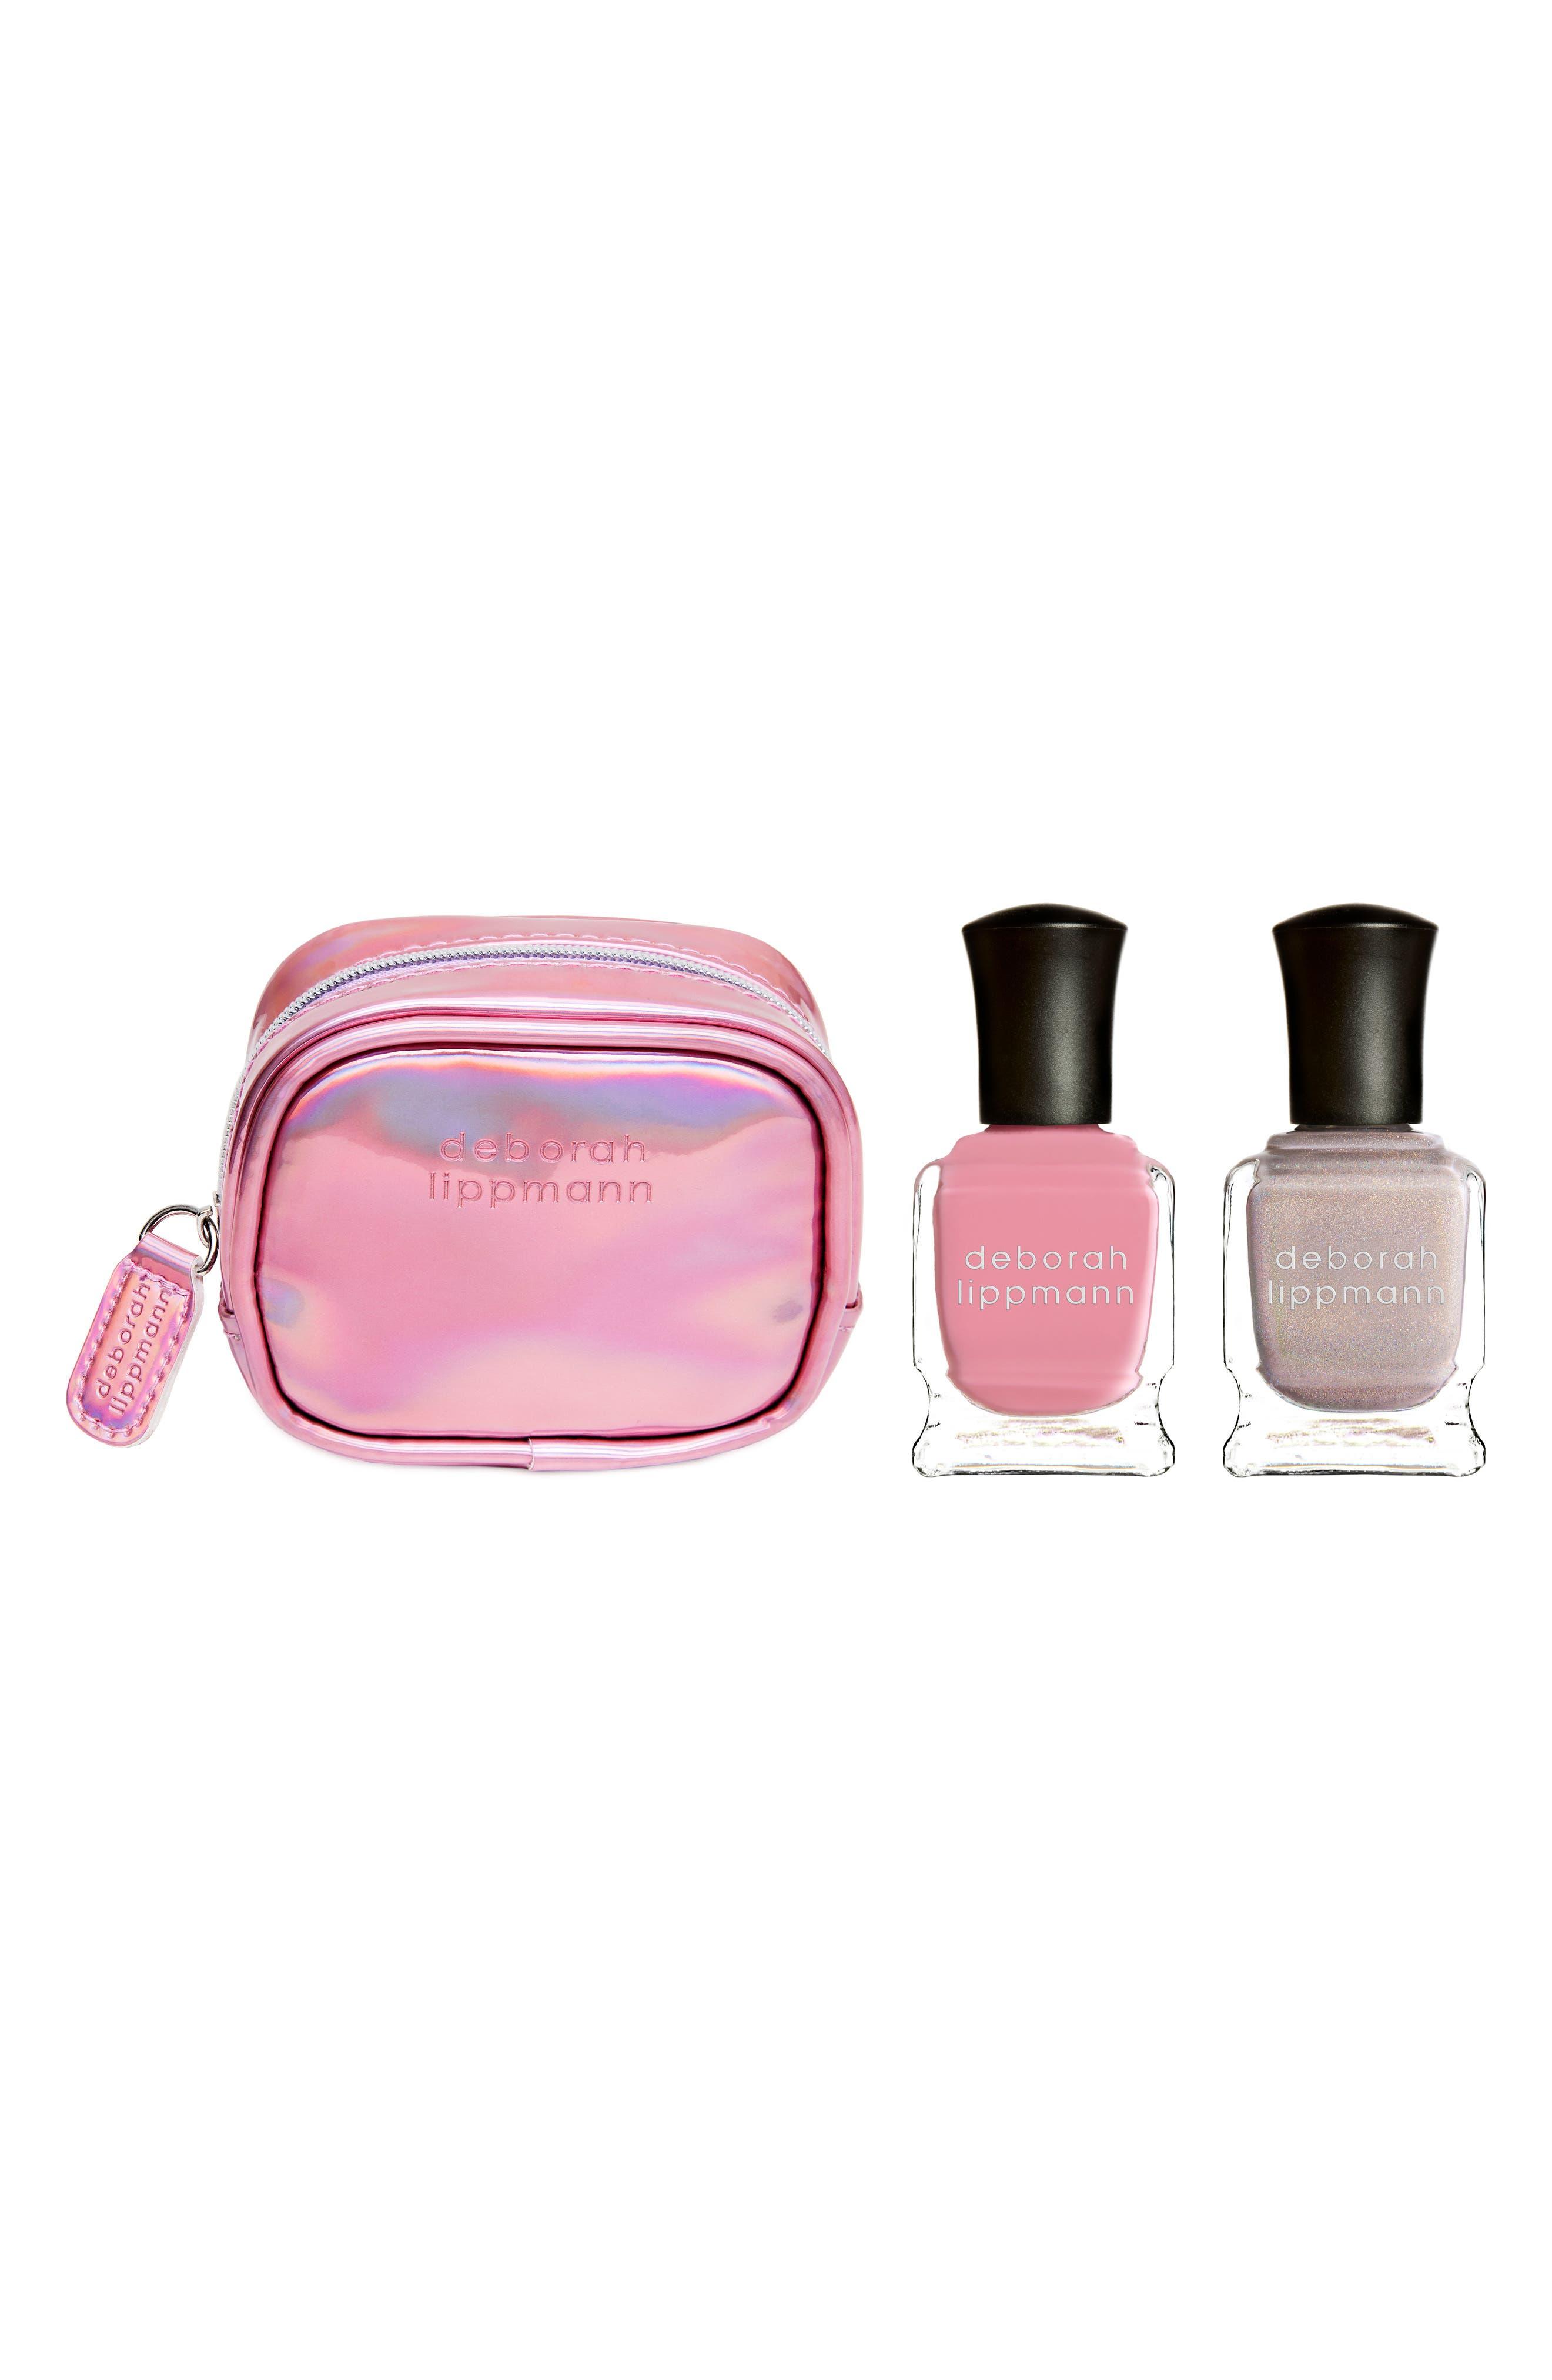 Deborah Lippmann Hologram Girl Nail Color Duo ($24 Value)